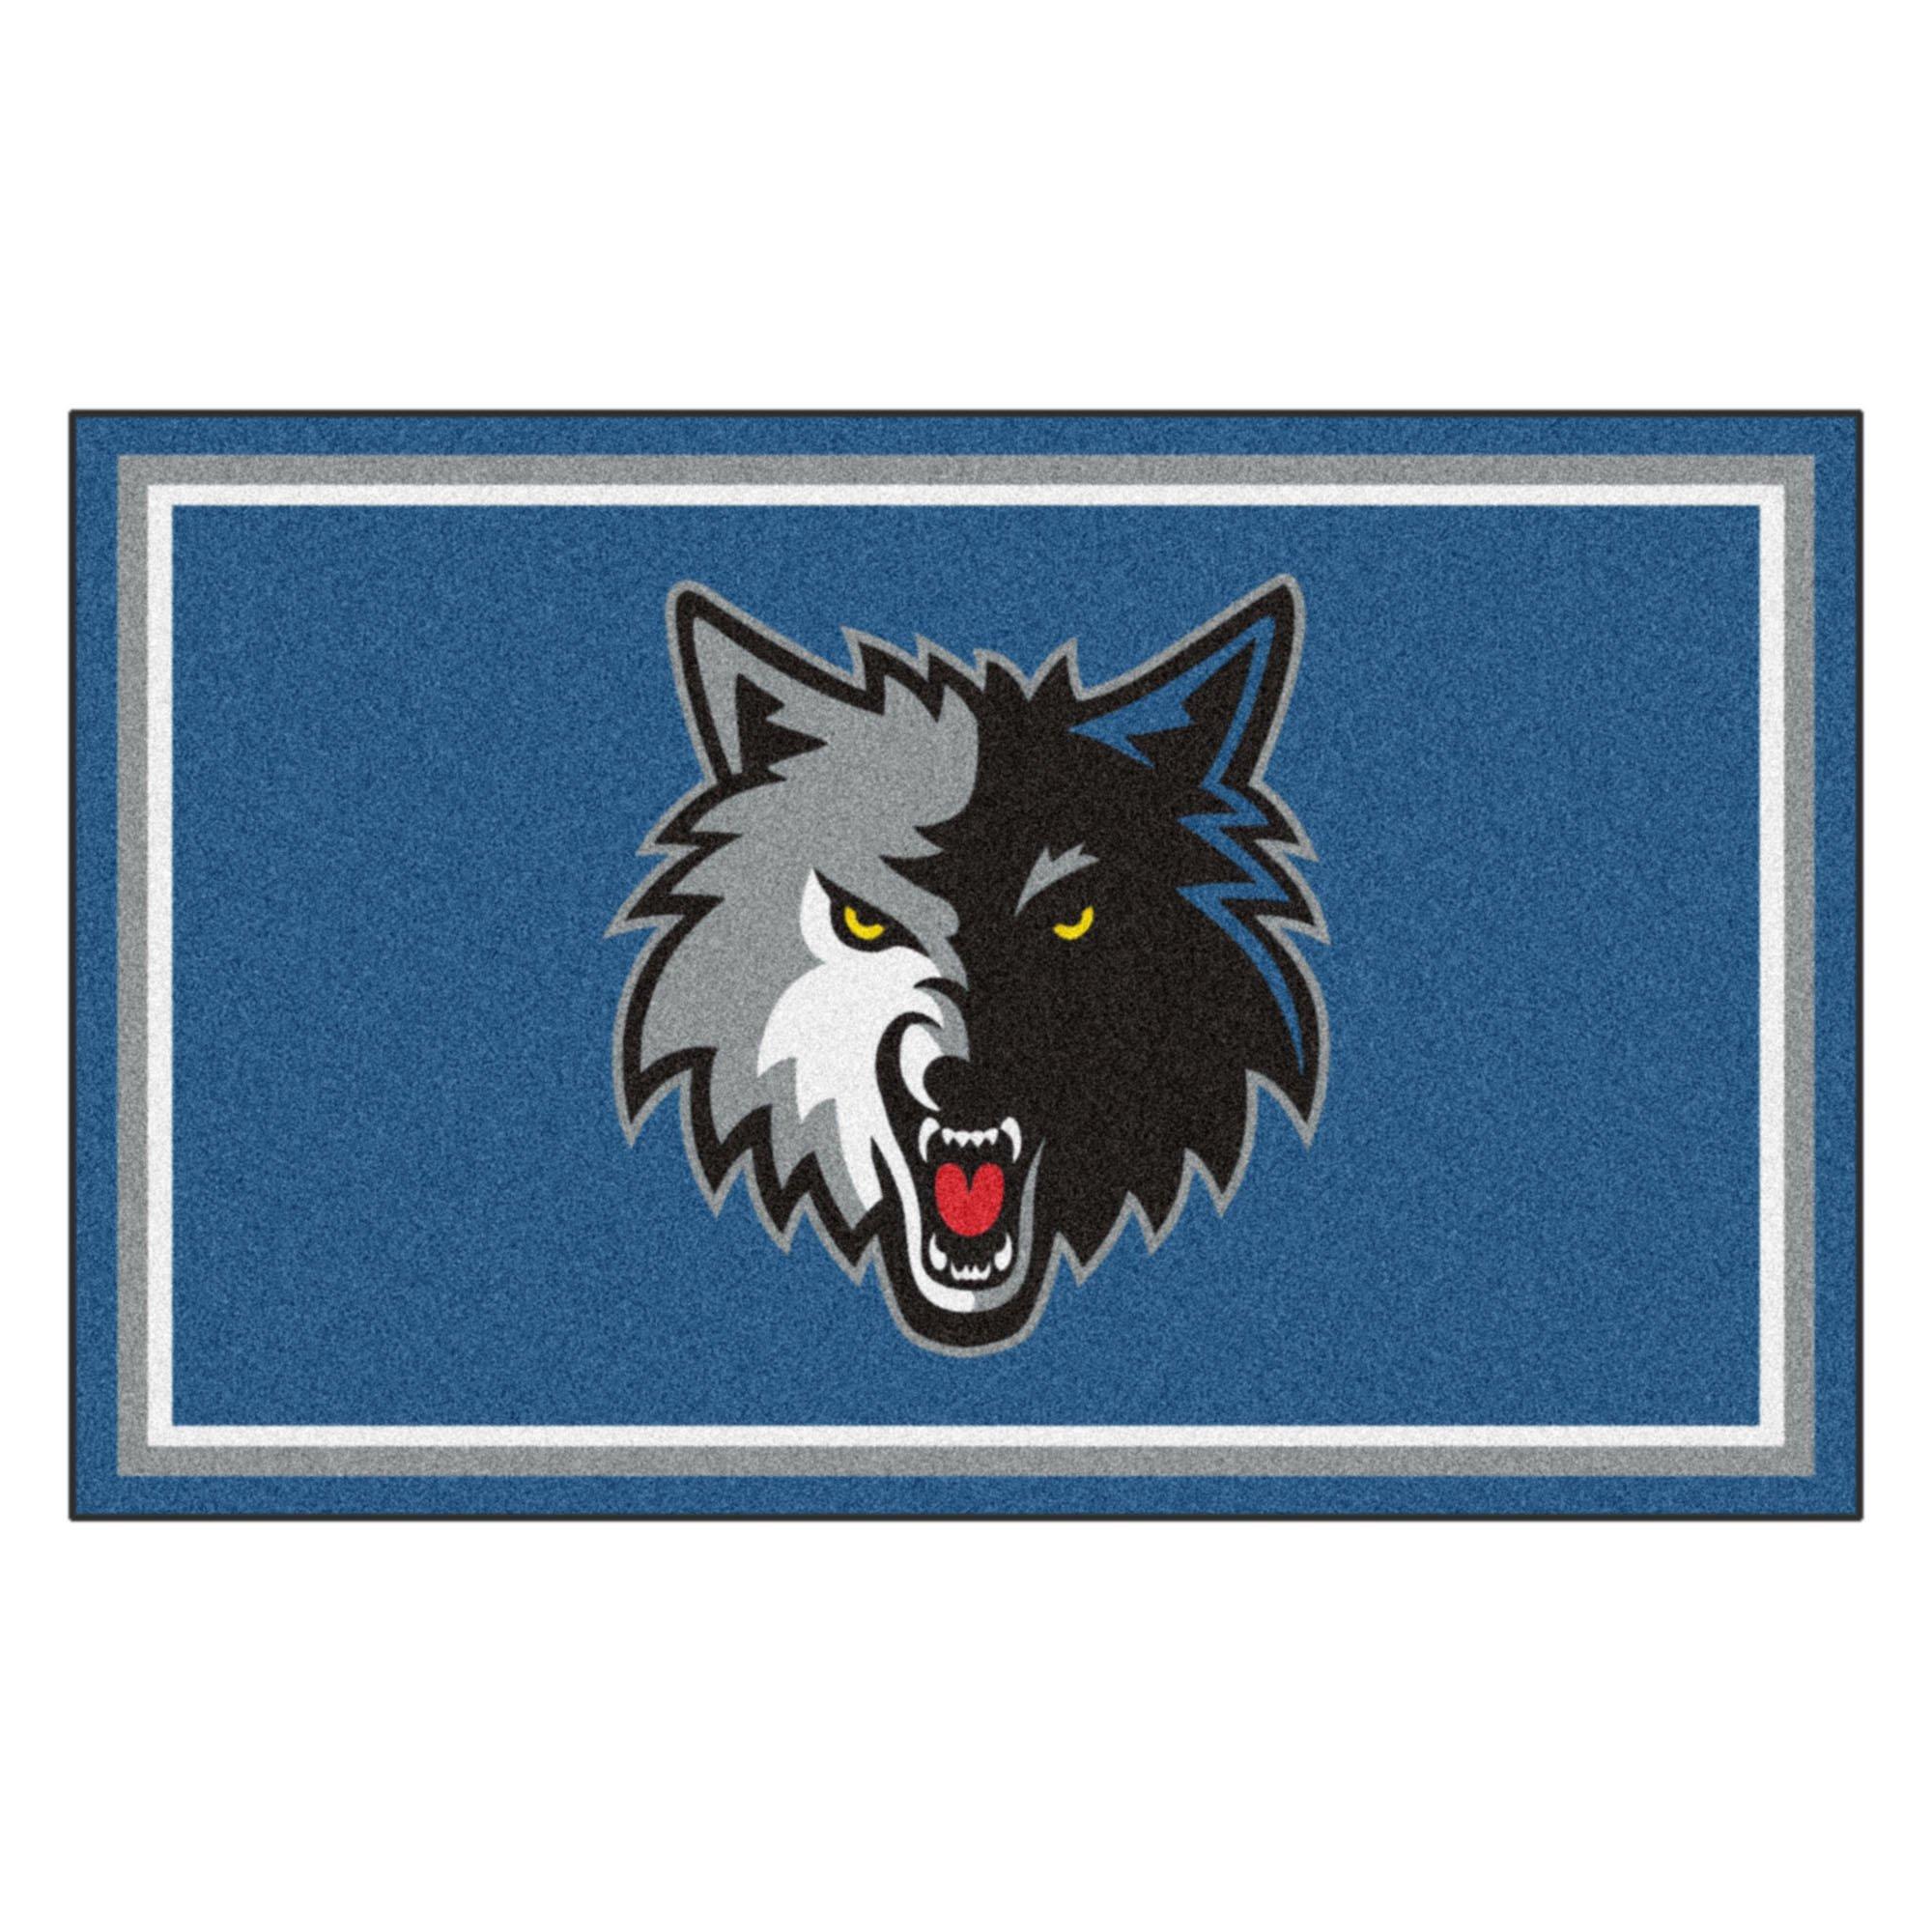 FANMATS 20435 NBA - Minnesota Timberwolves 4'X6' Rug, Team Color, 44''x71''